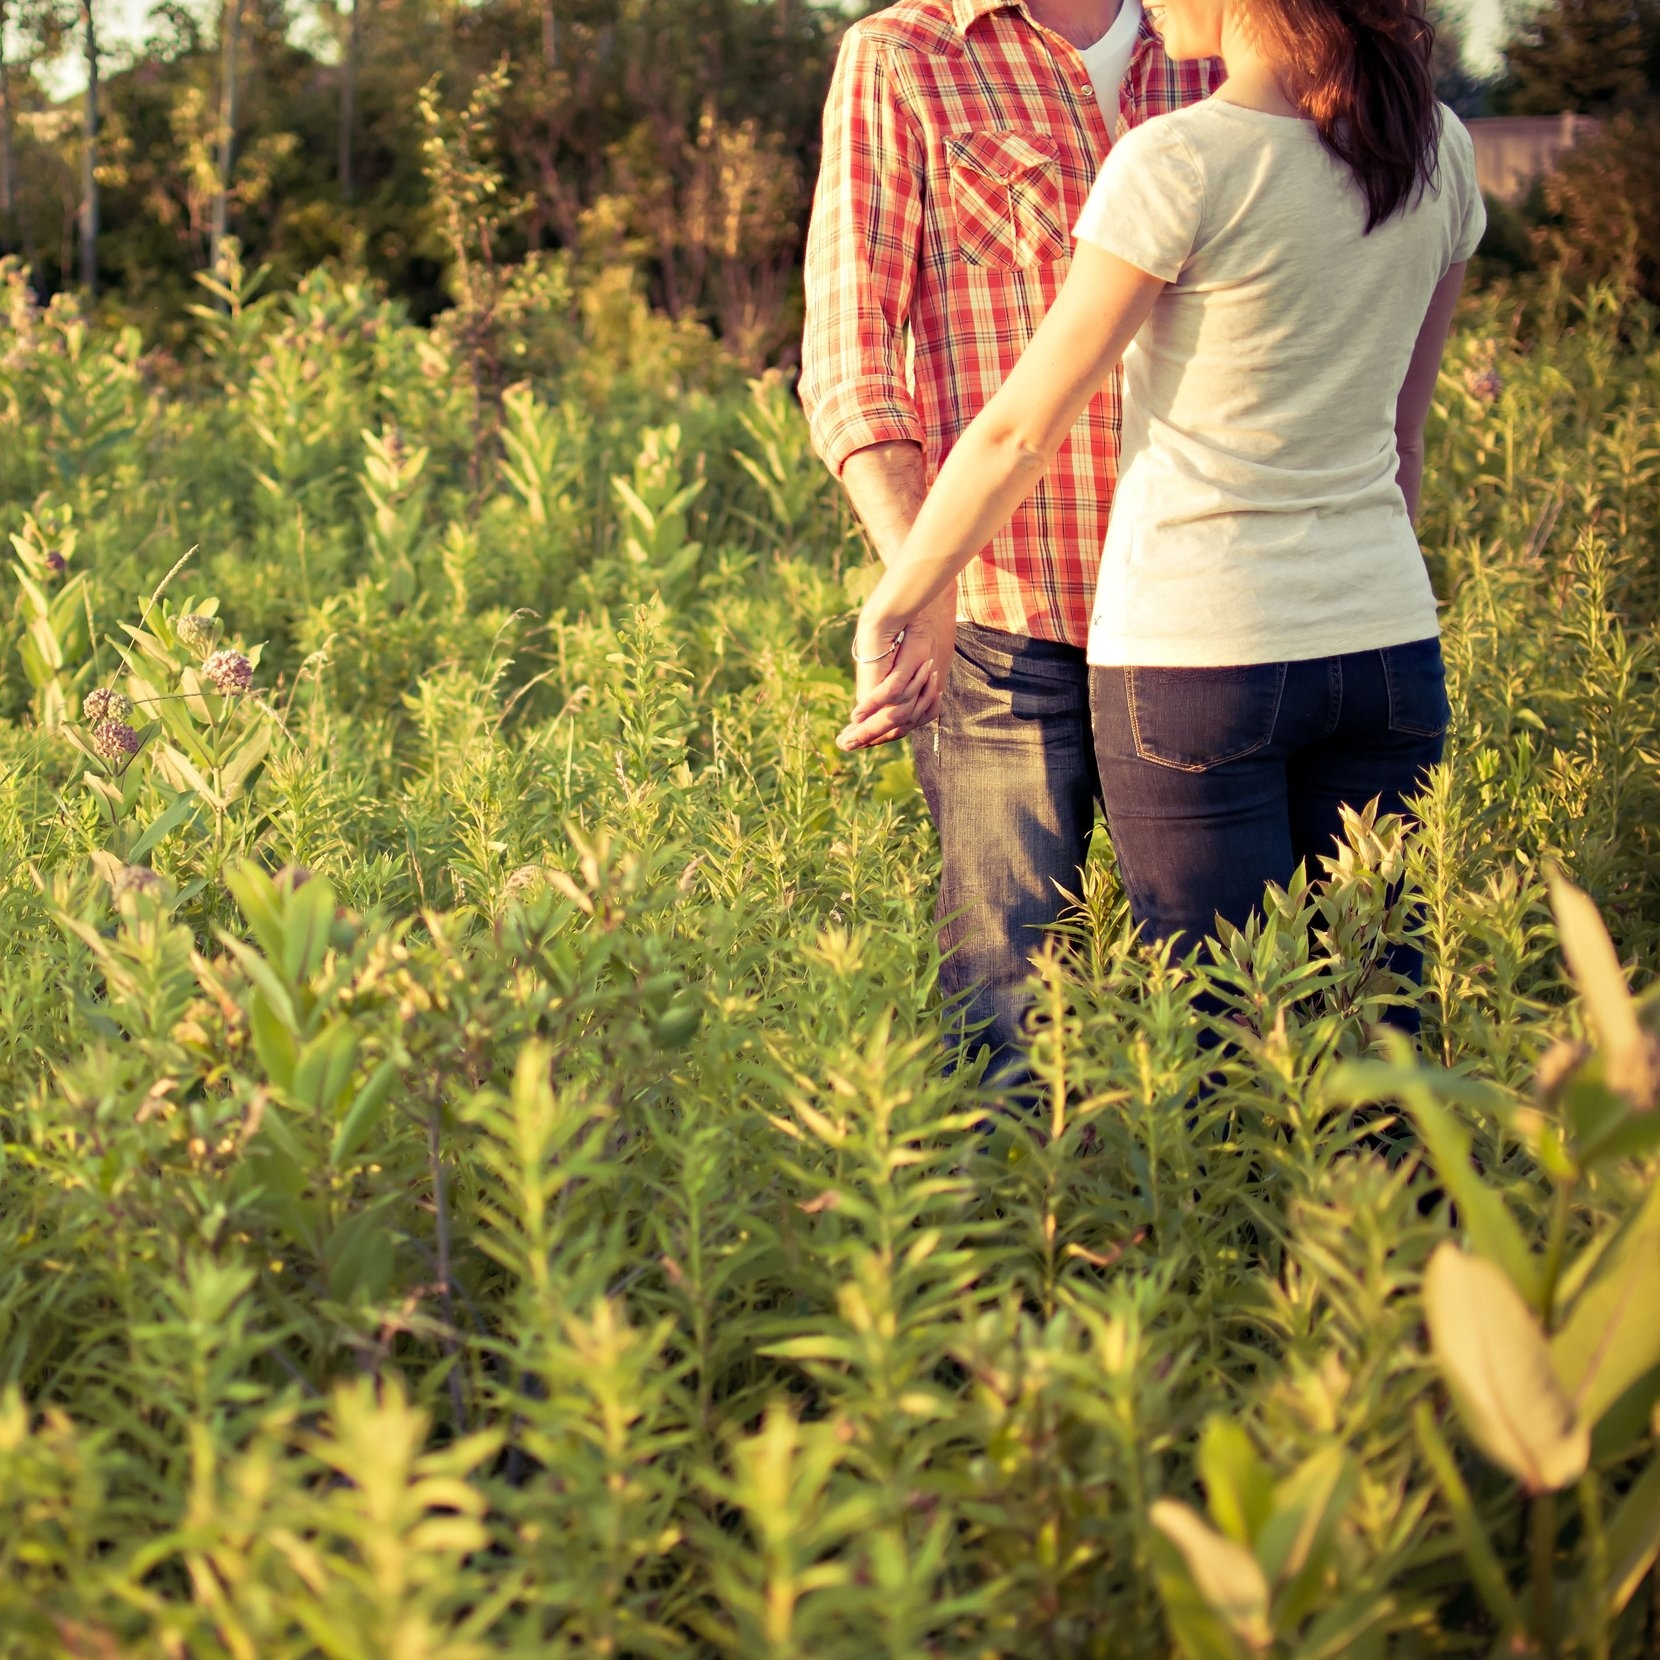 countryside-couple-engaged-139199.jpg